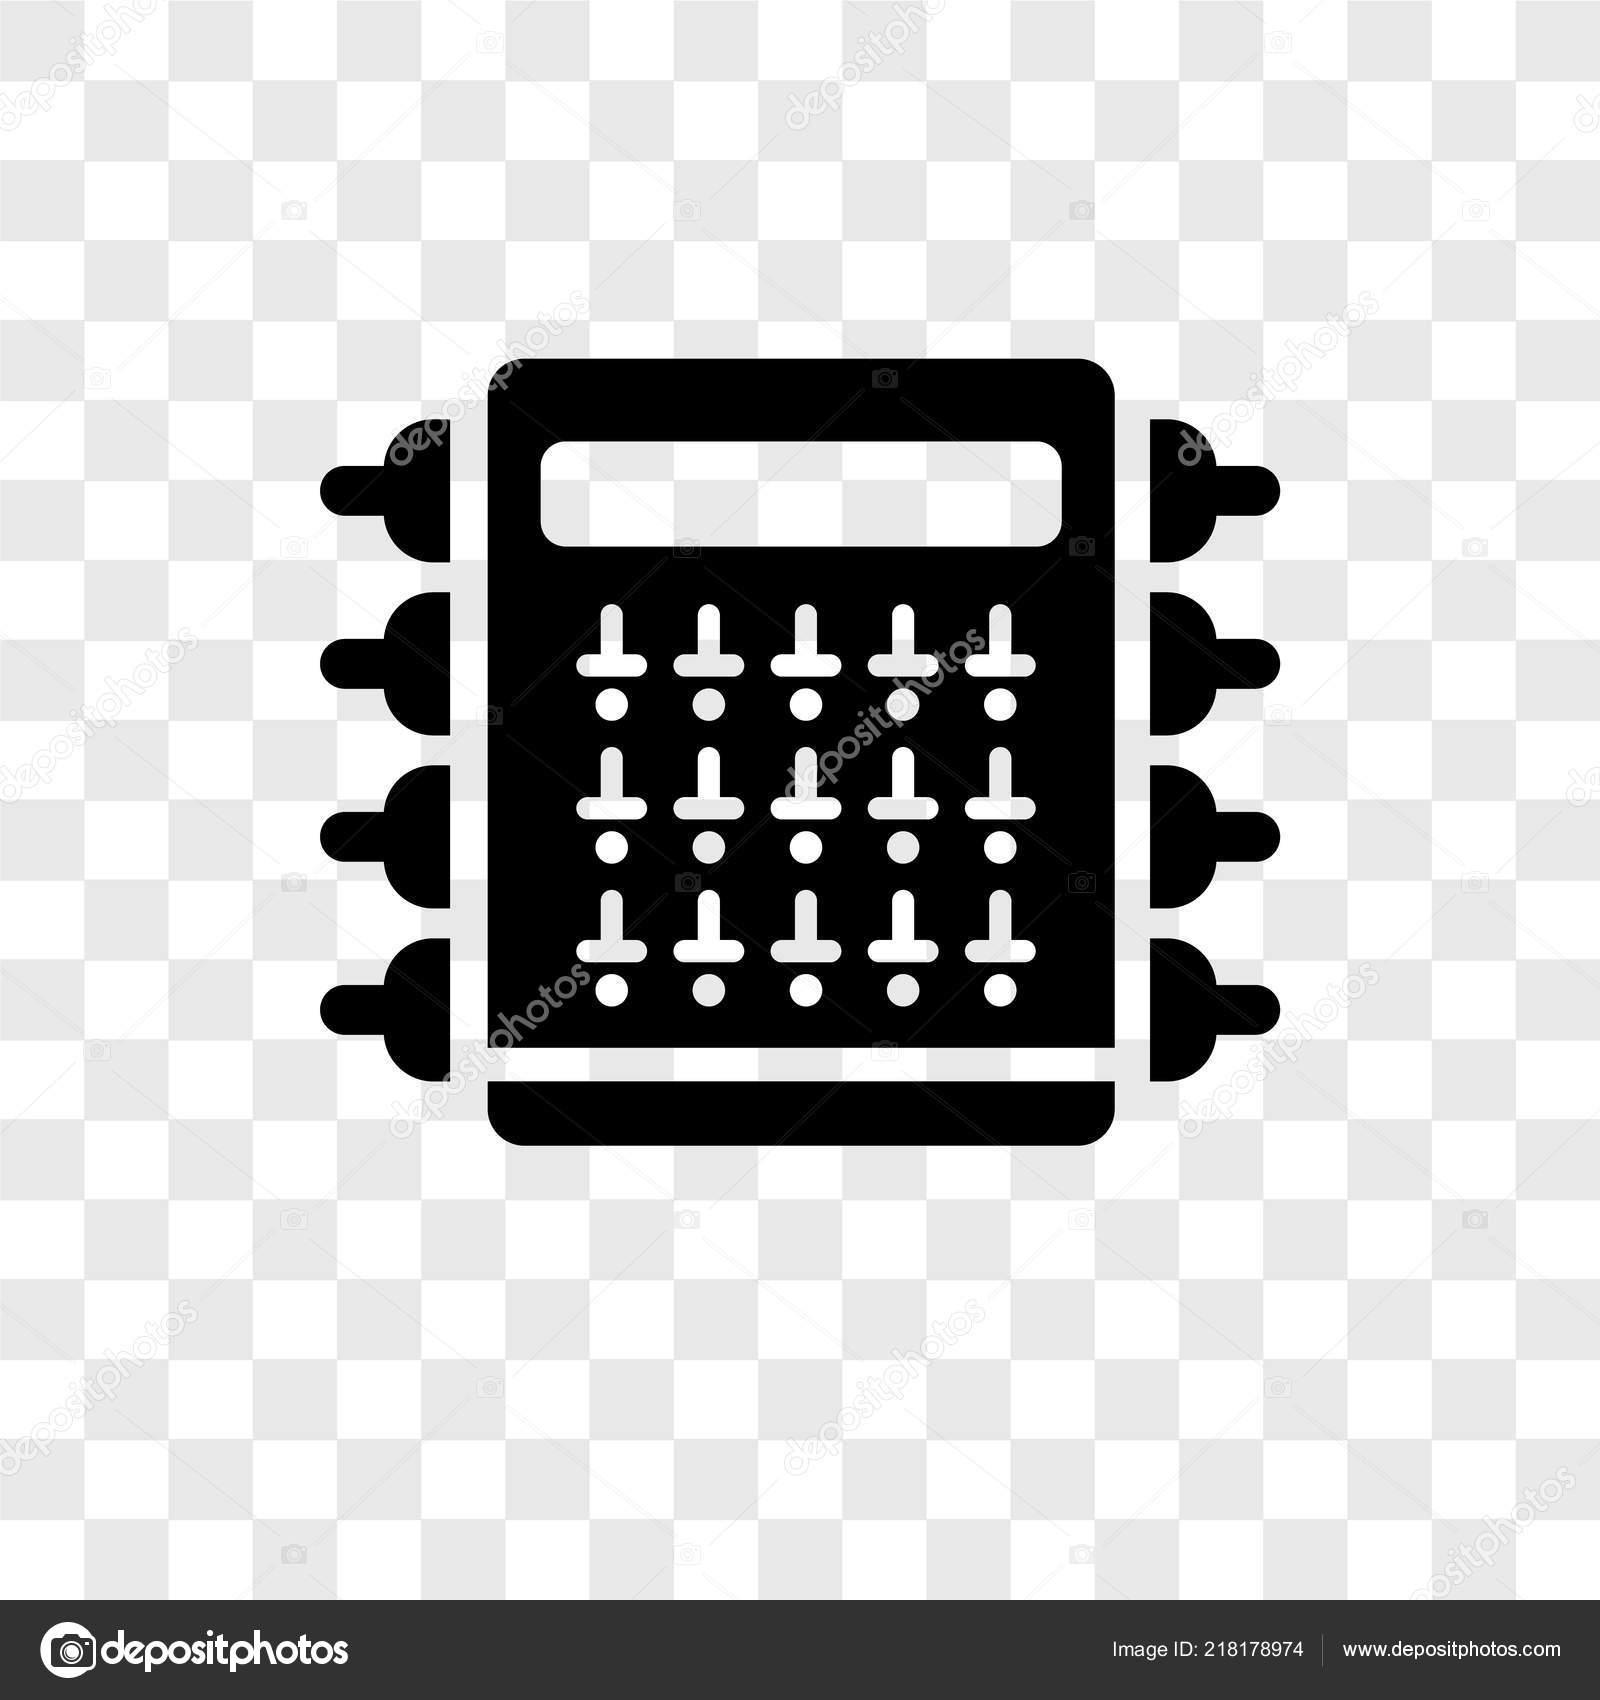 fuse box icon trendy design style fuse box icon isolated Dual Pole Symbol